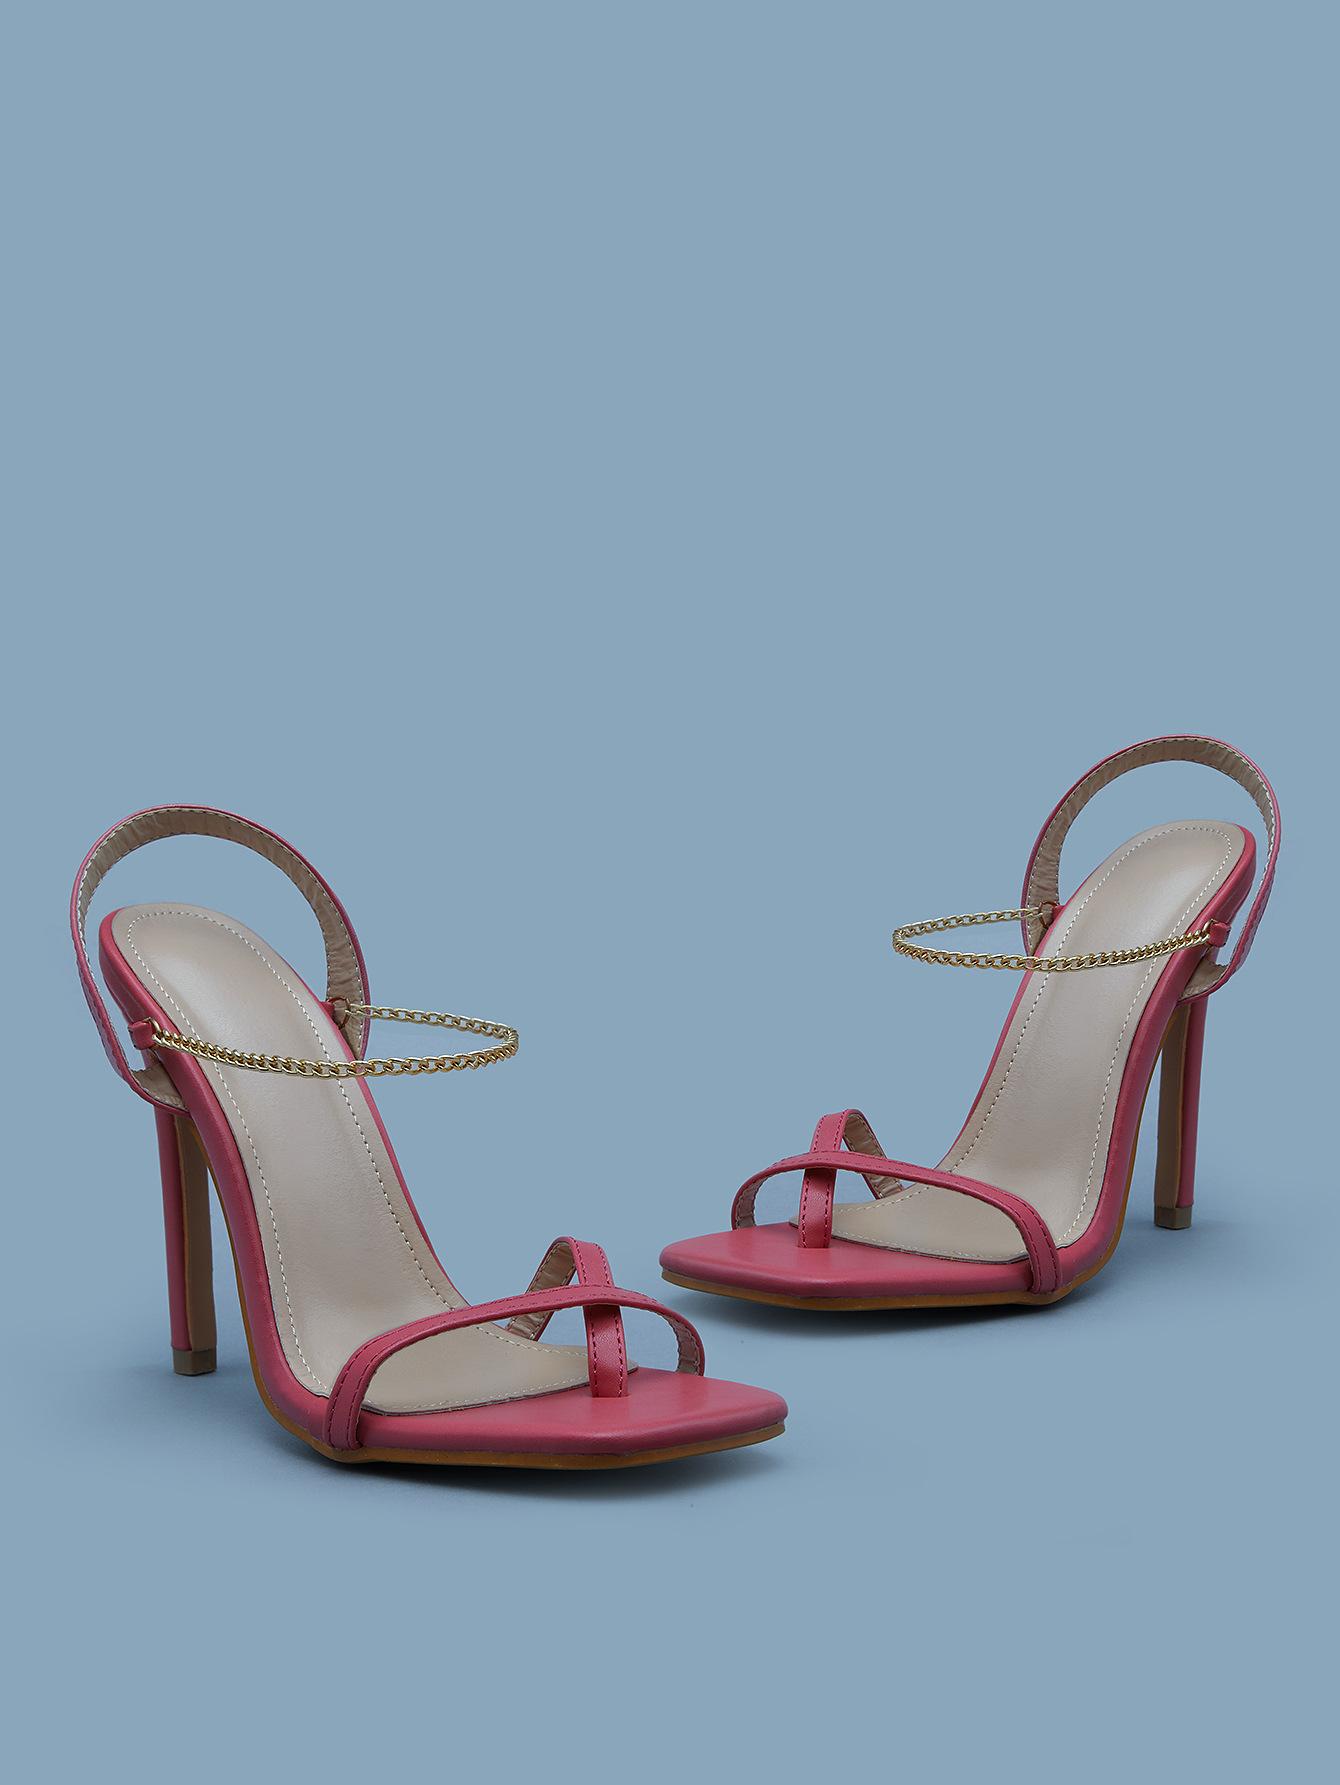 new fashion chain set toe square toe stiletto high heel sandals  NHCA244273